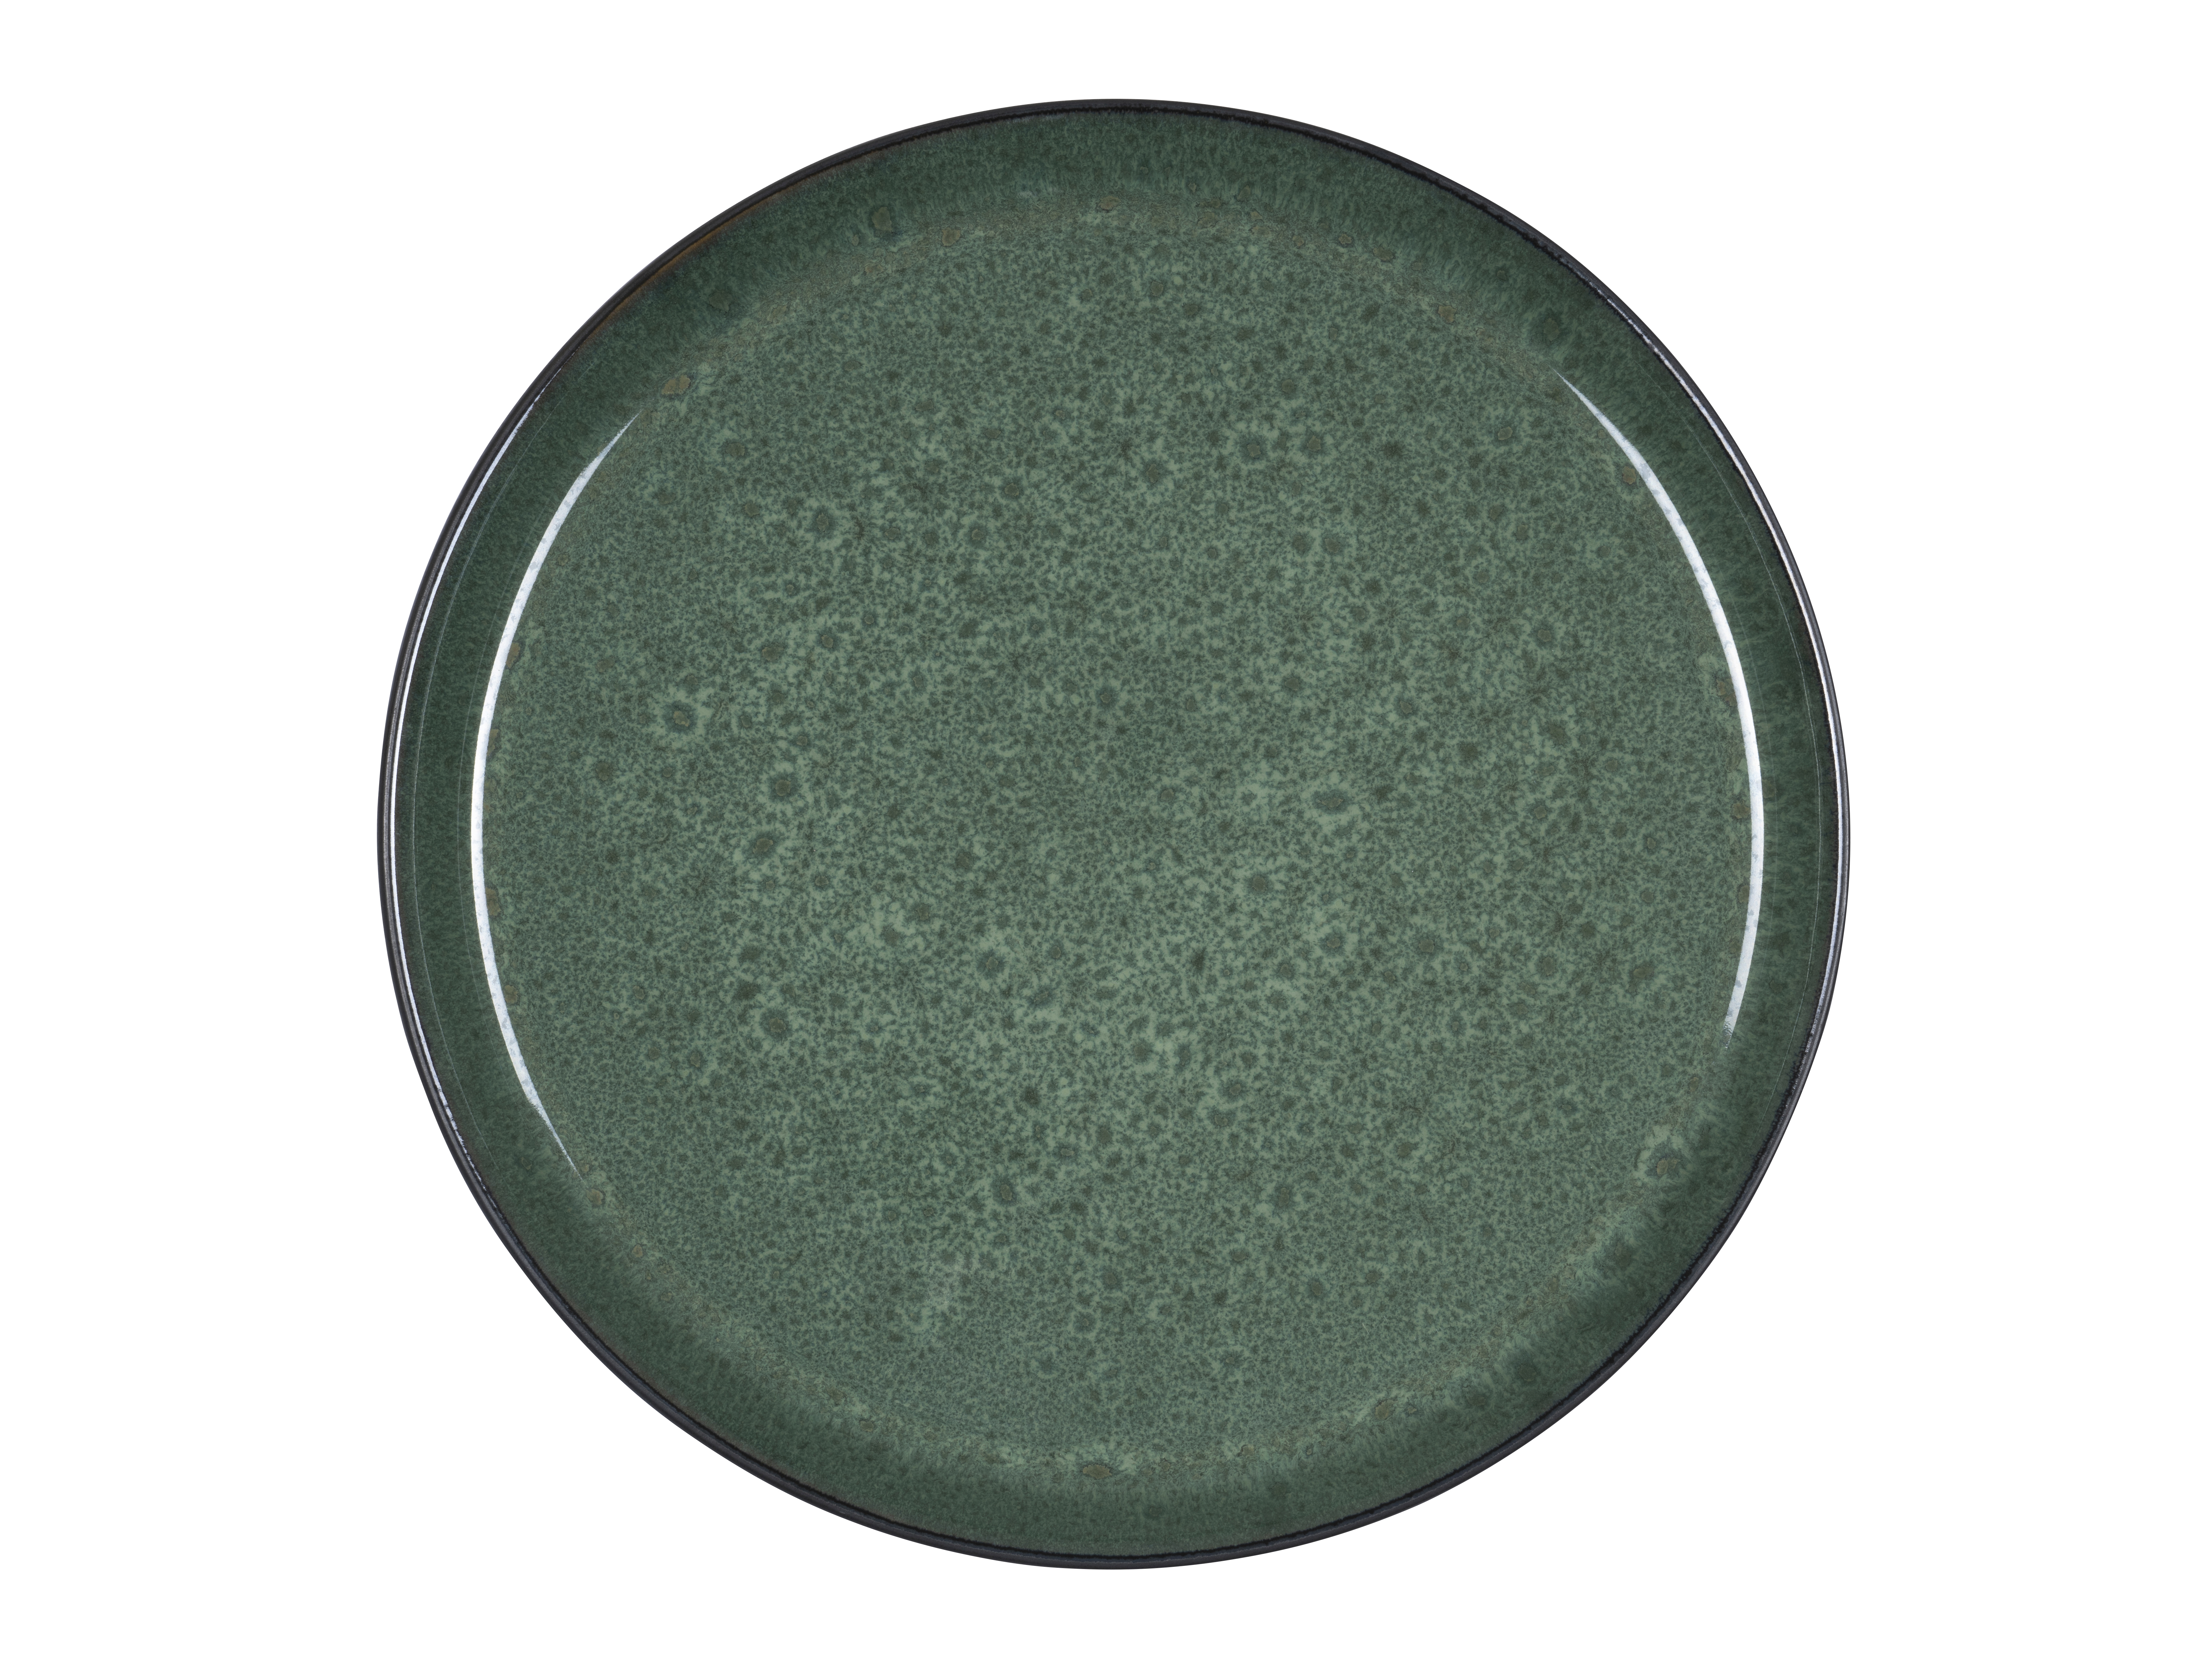 Bitz Gastro middagstallerken, Ø27 cm, sort/grøn